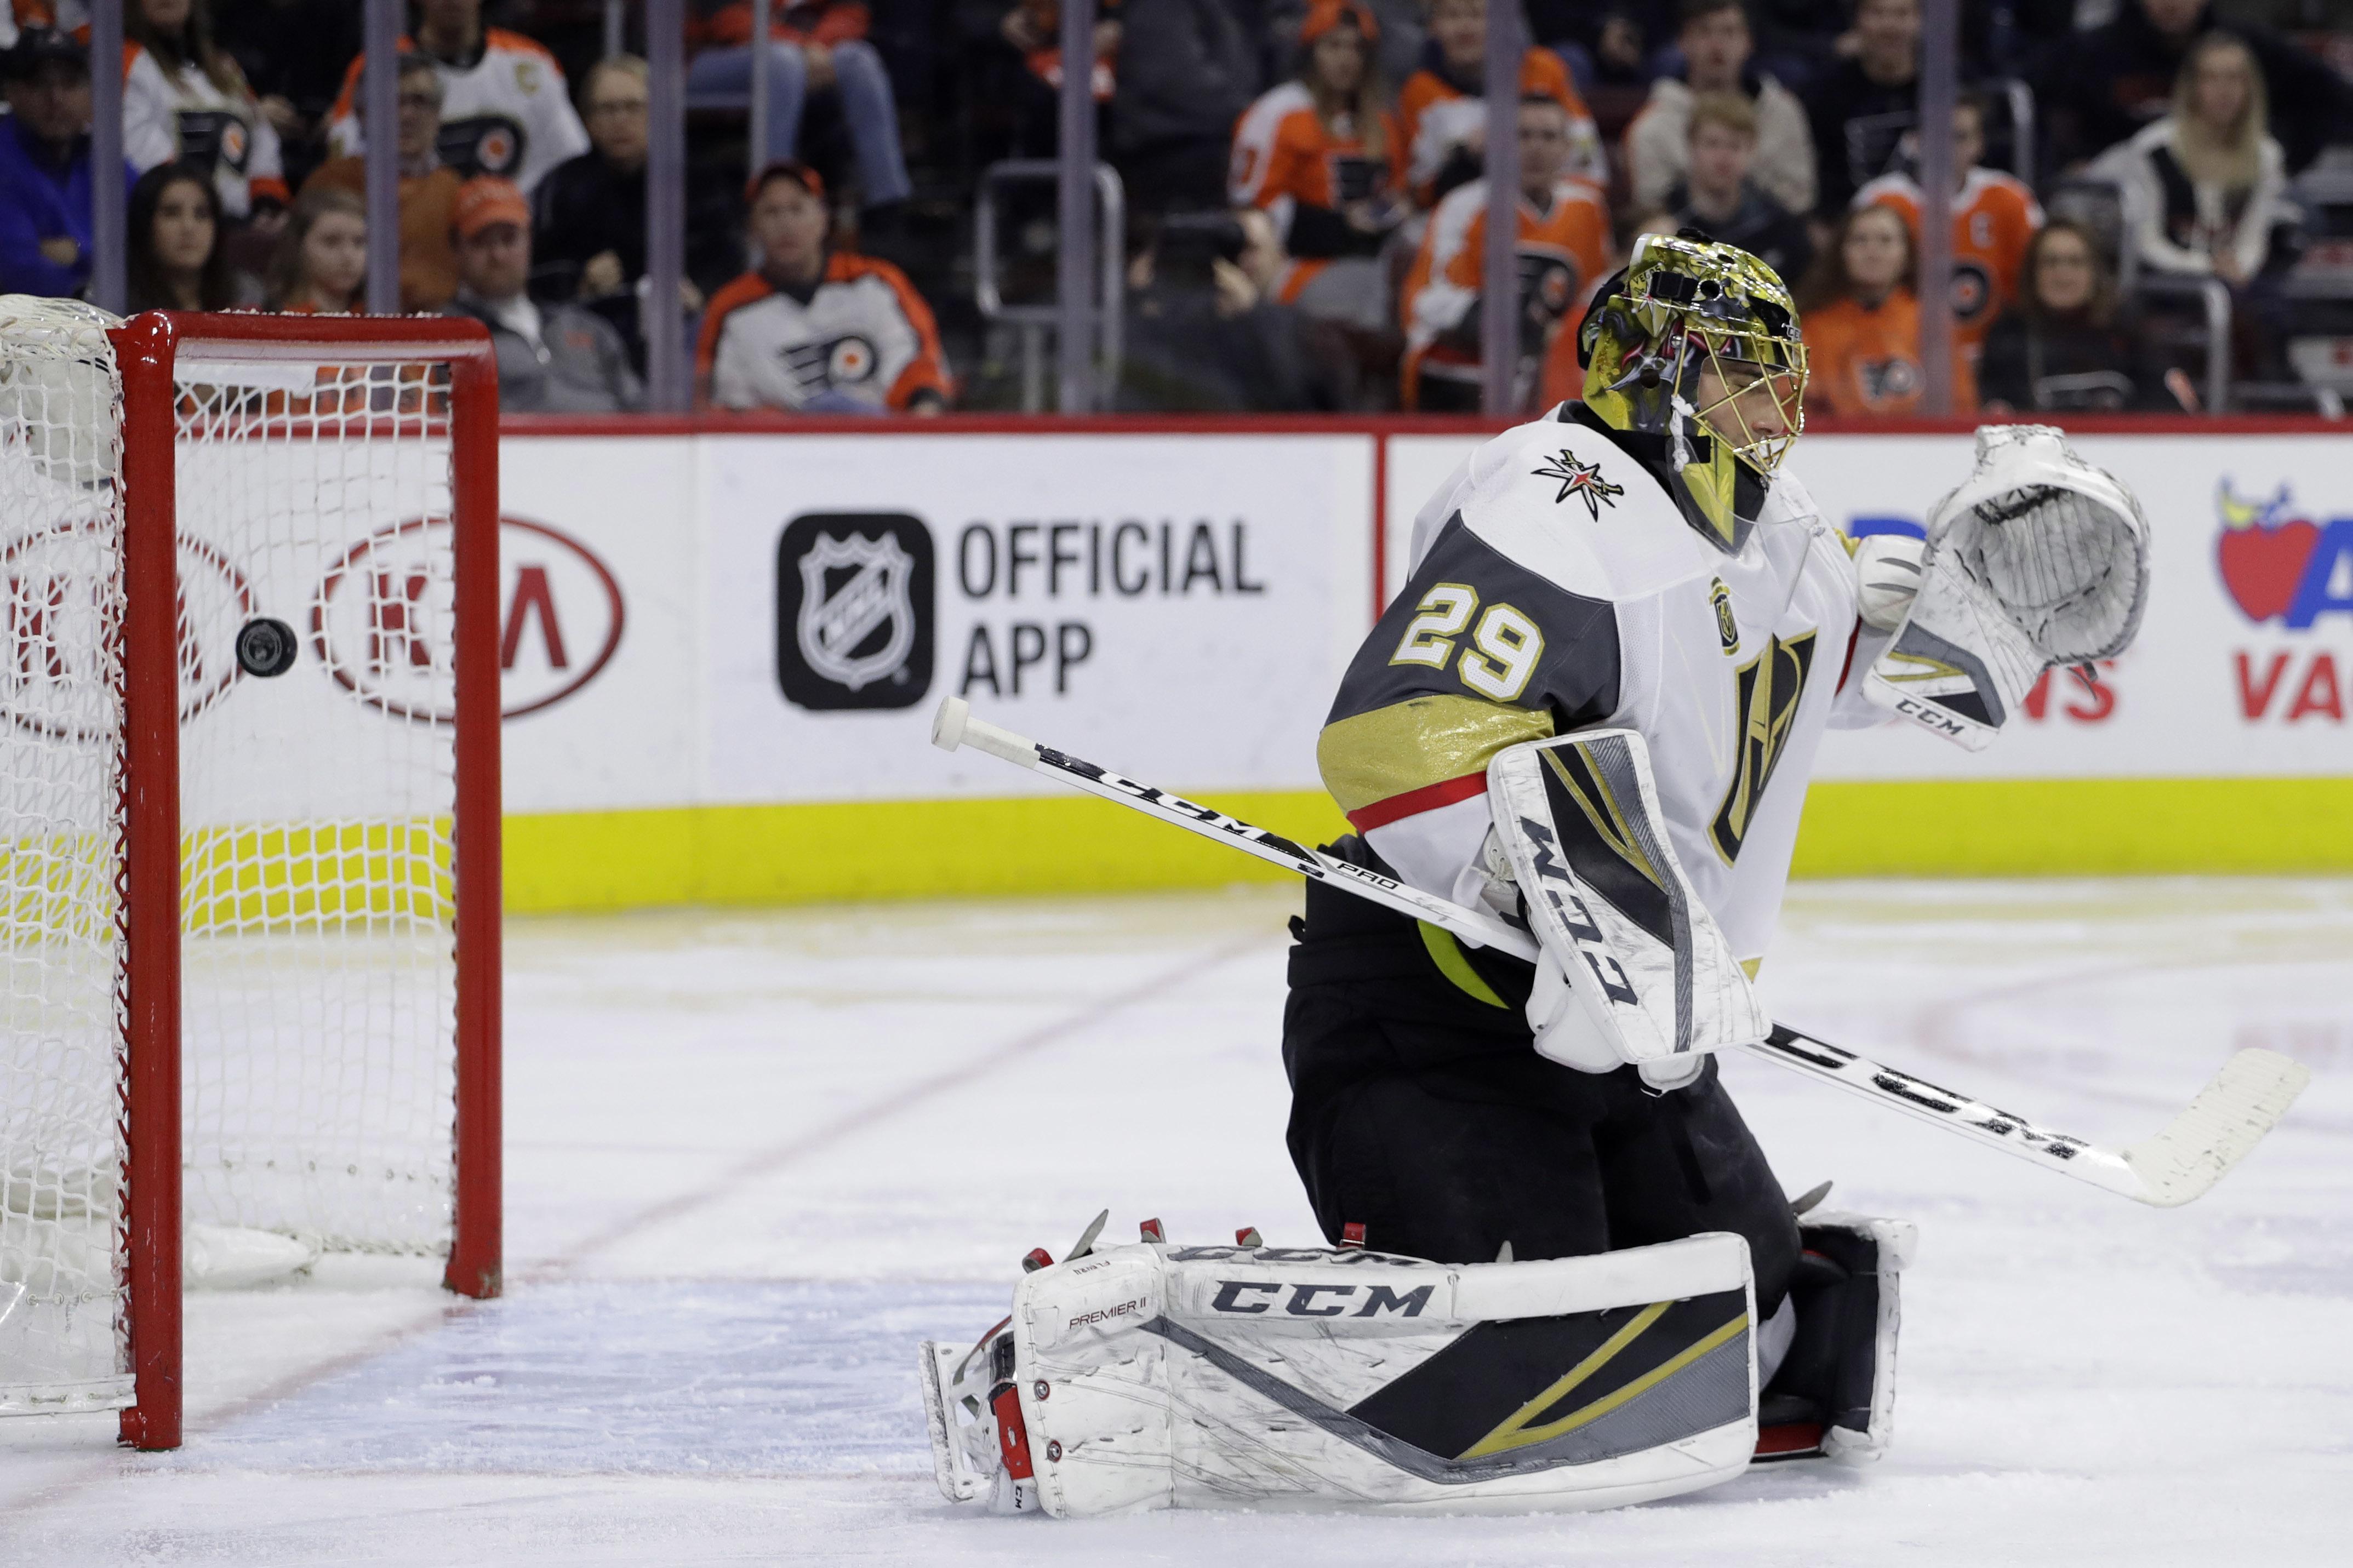 Golden_knights_flyers_hockey_31855